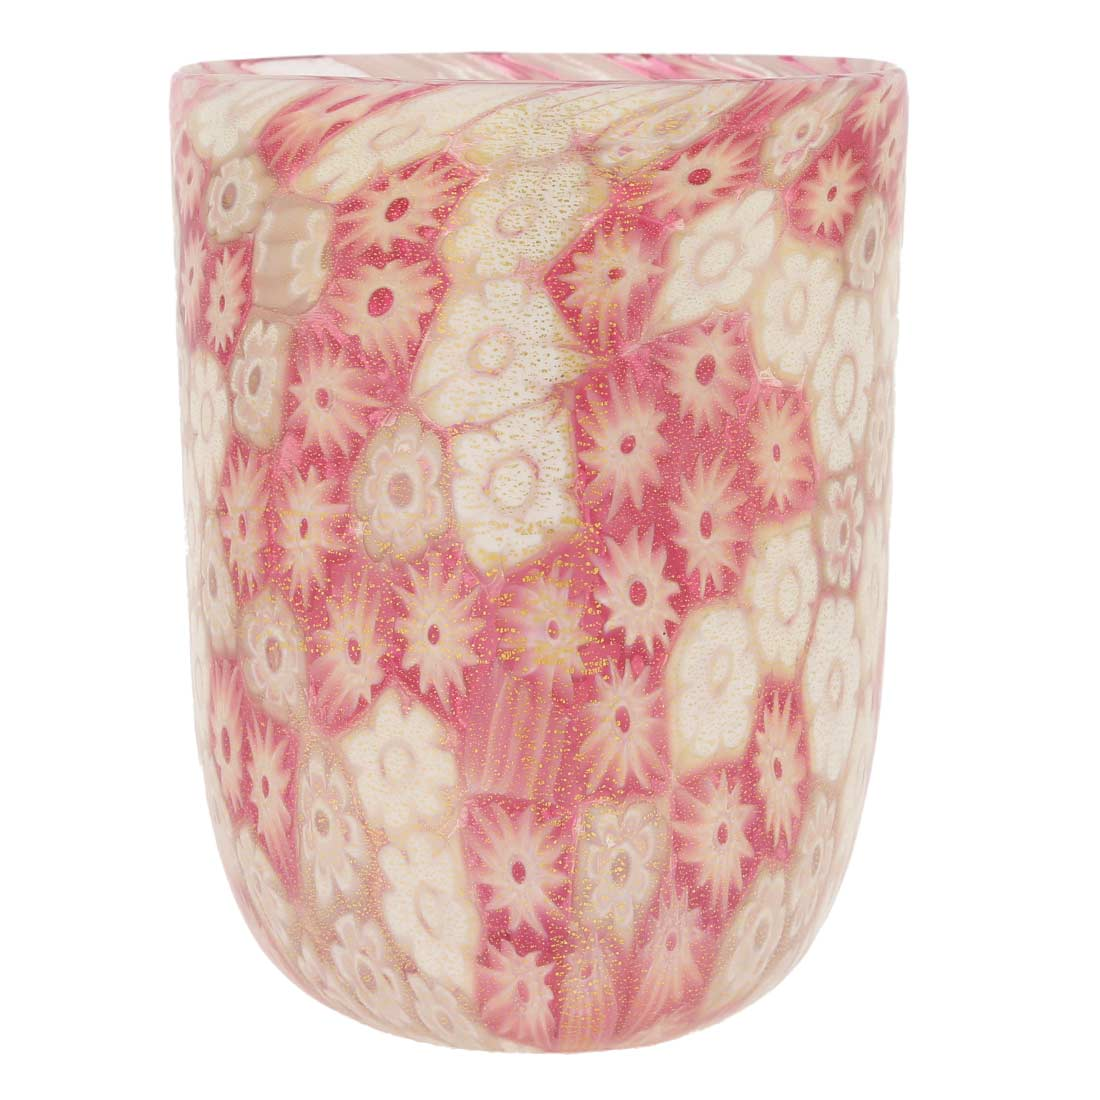 Murano Tumbler - Rose Gold Millefiori